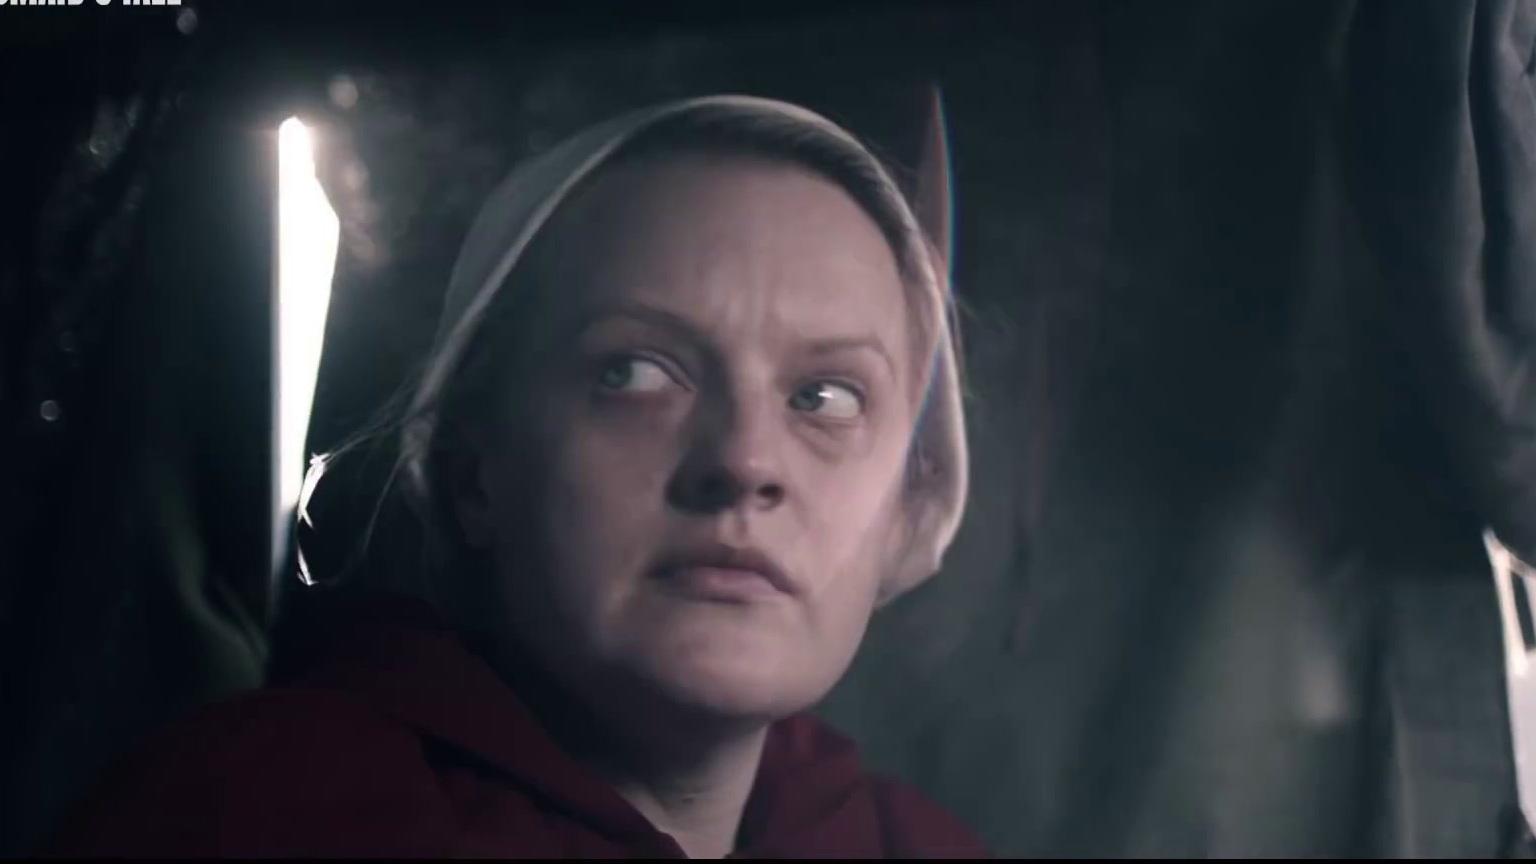 The Handmaid's Tale: Season 4 Teaser